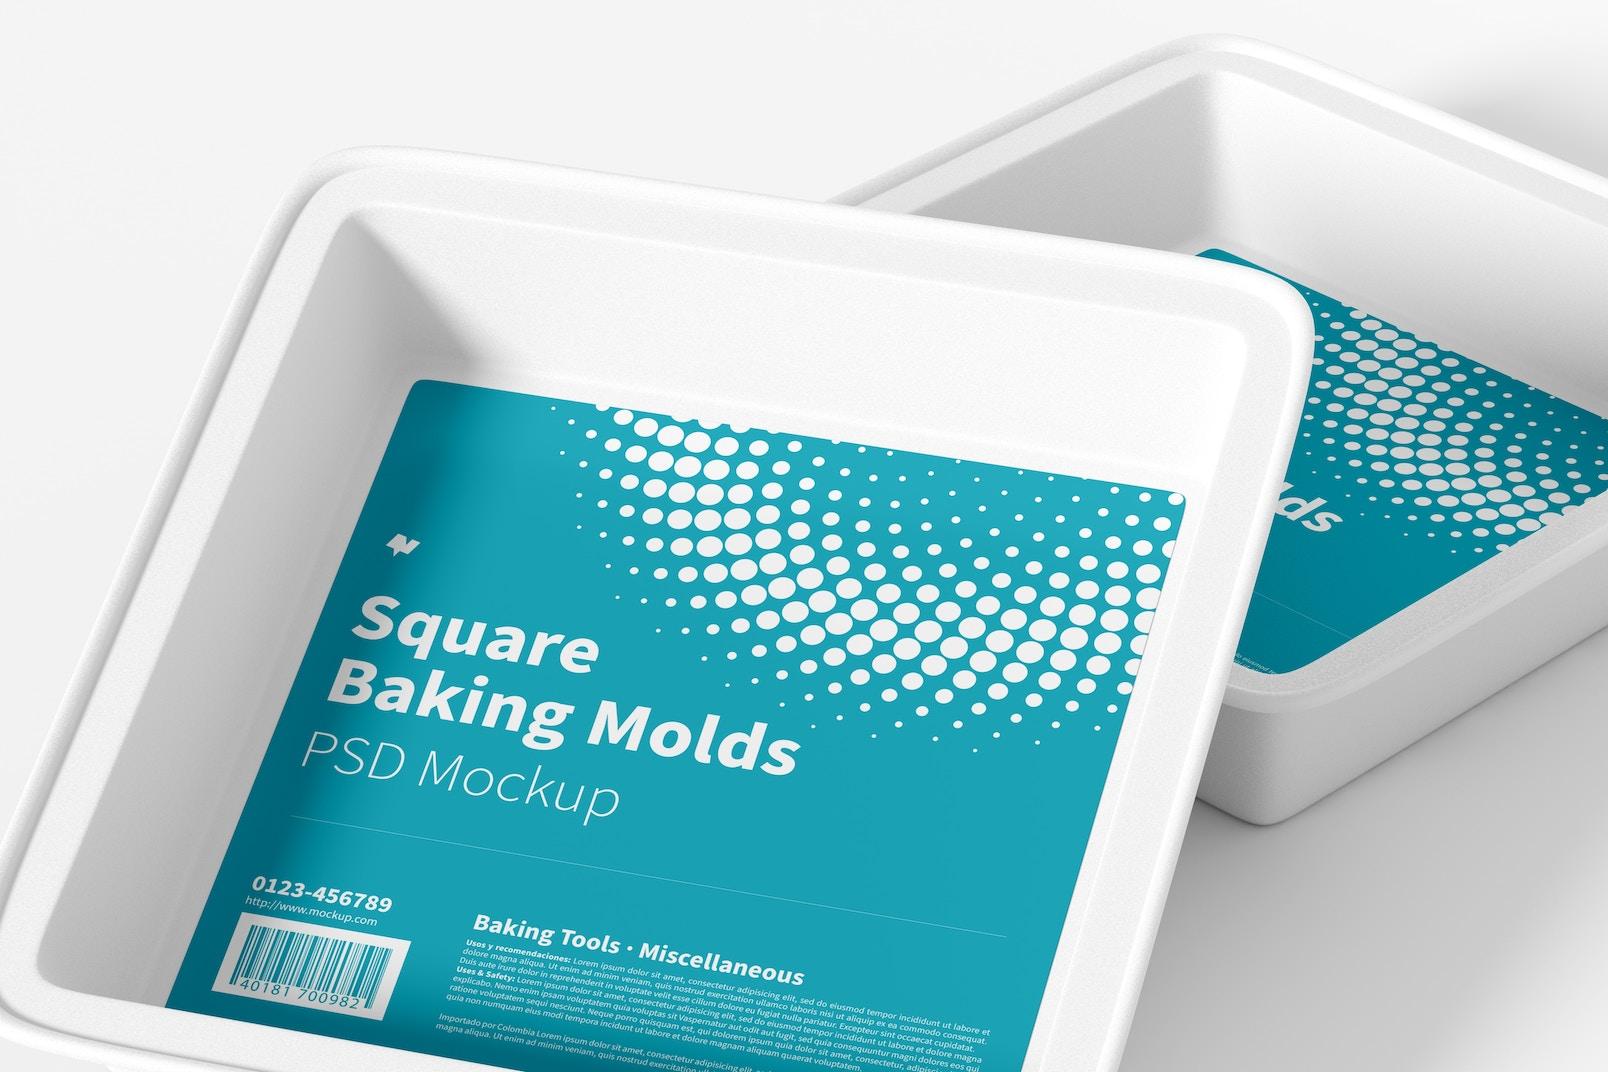 Square Baking Molds Mockup, Close Up